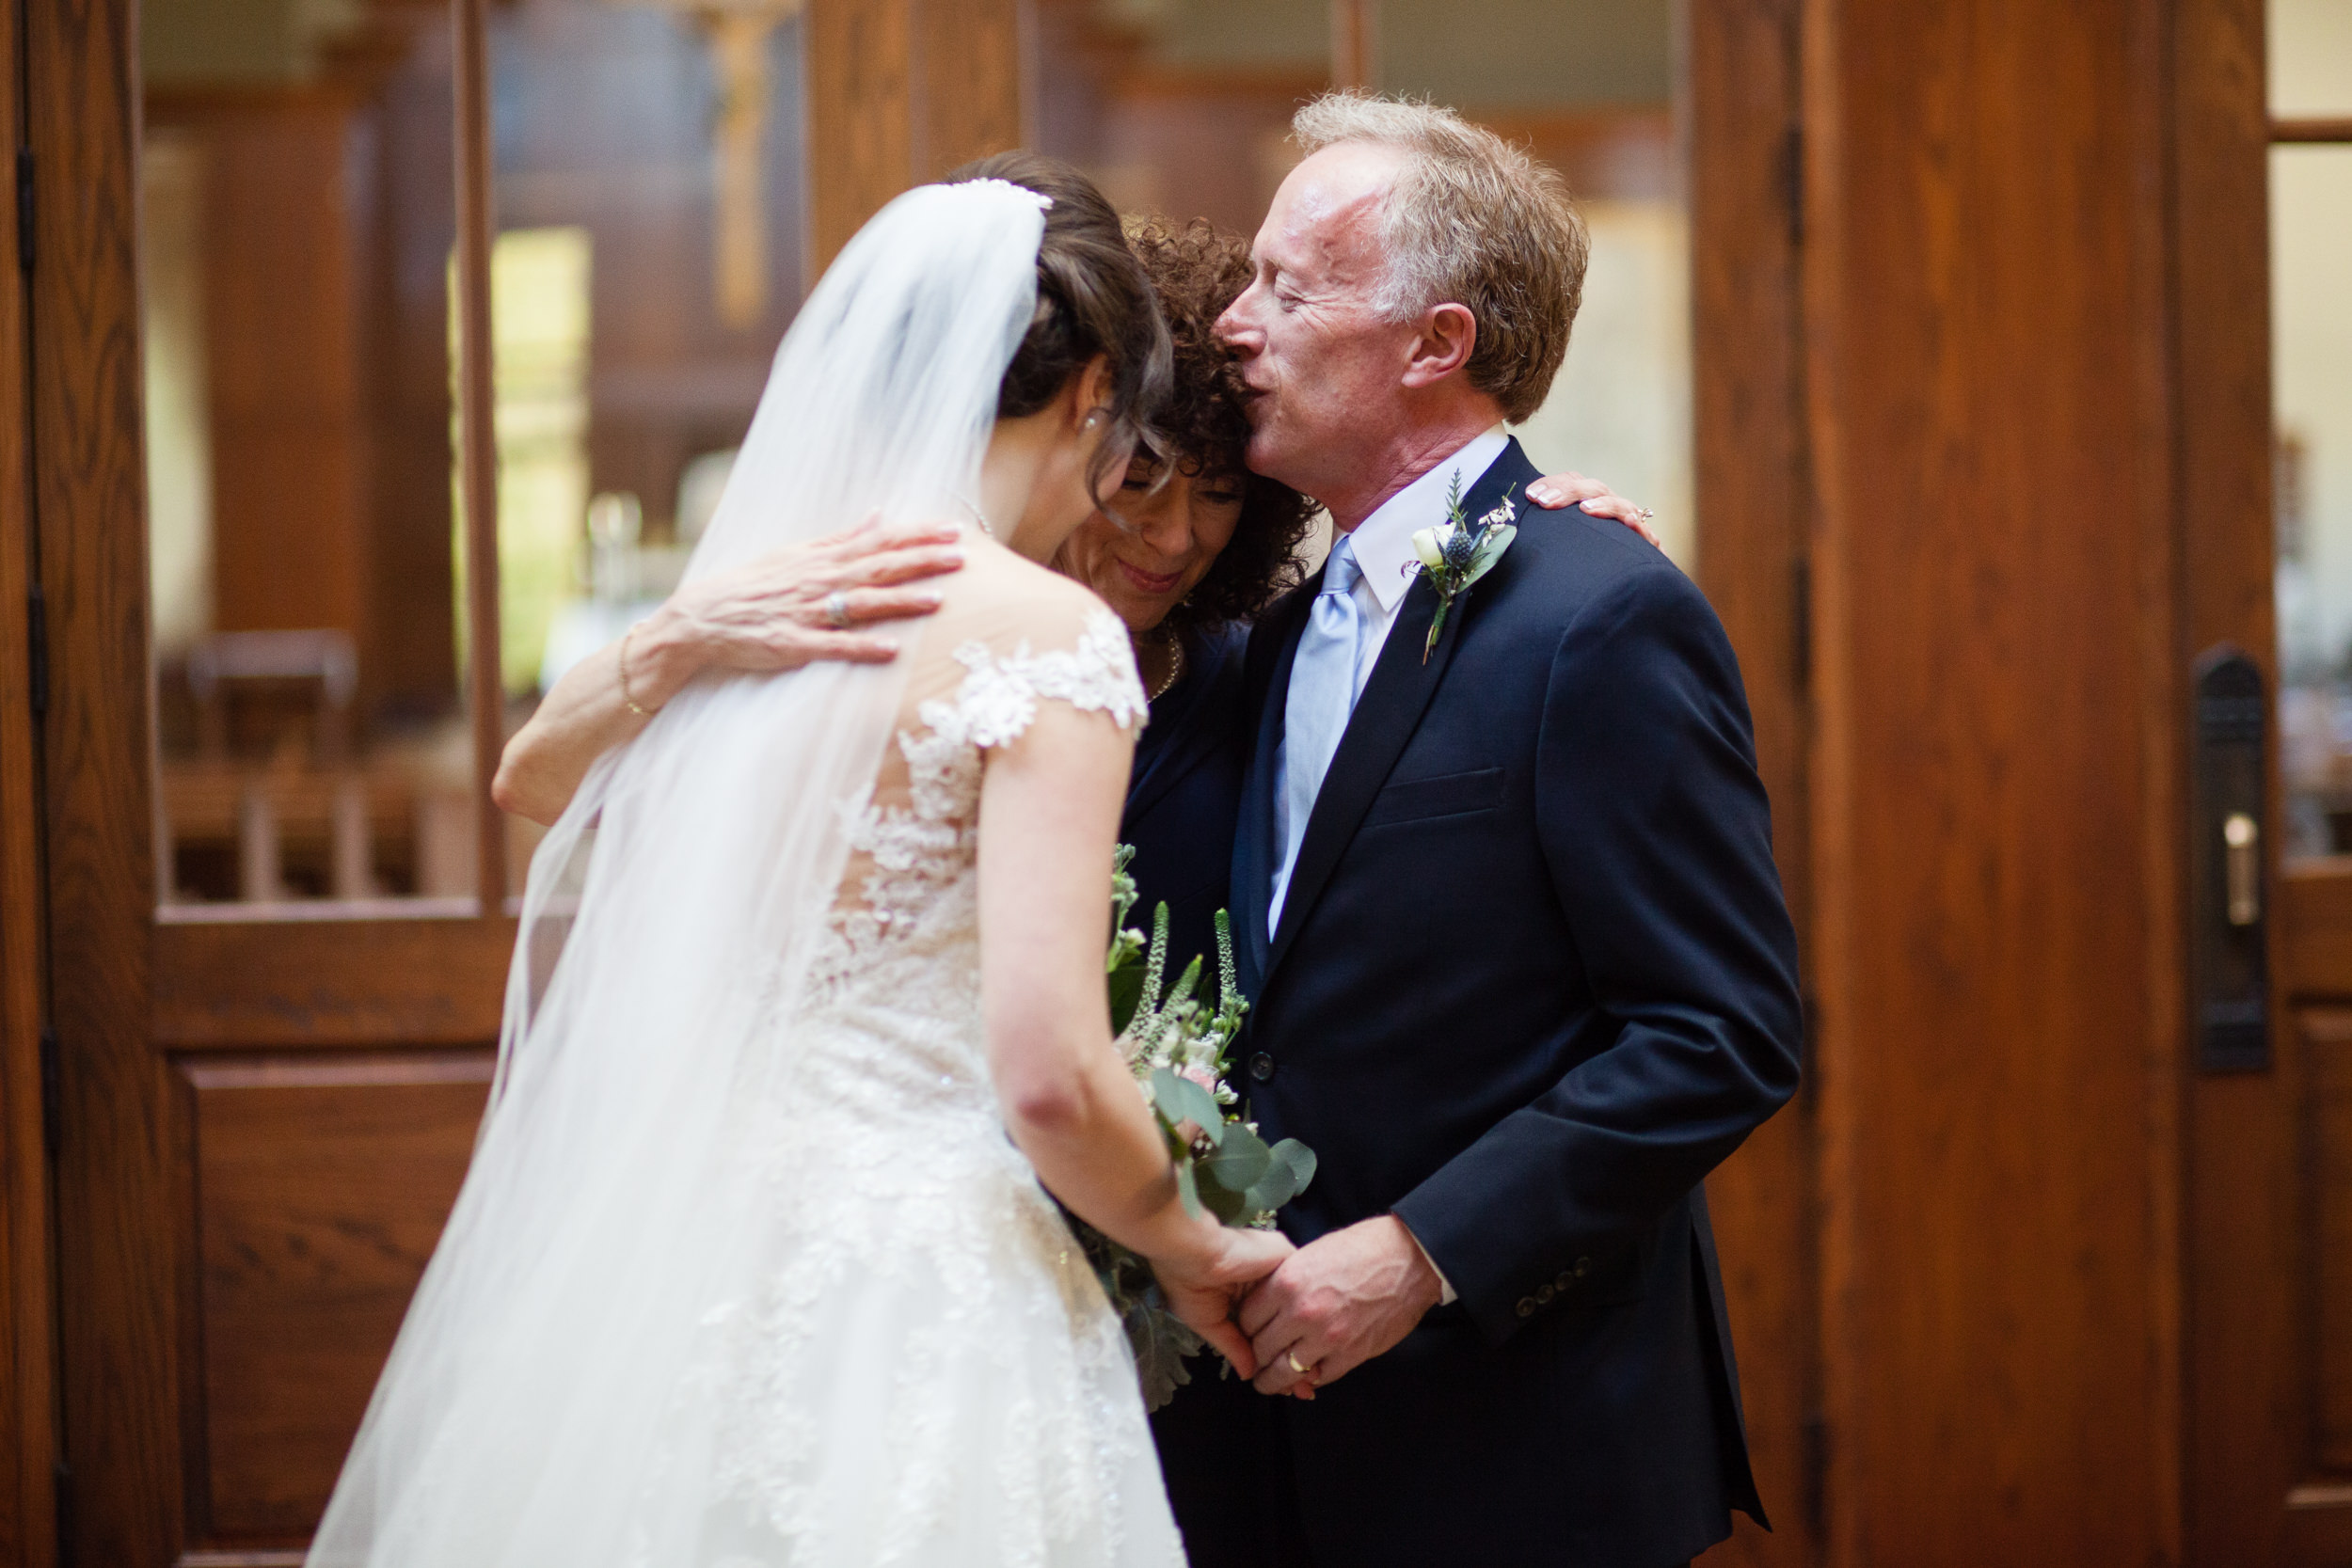 AB_Auburn_Wedding_2019-00019.jpg